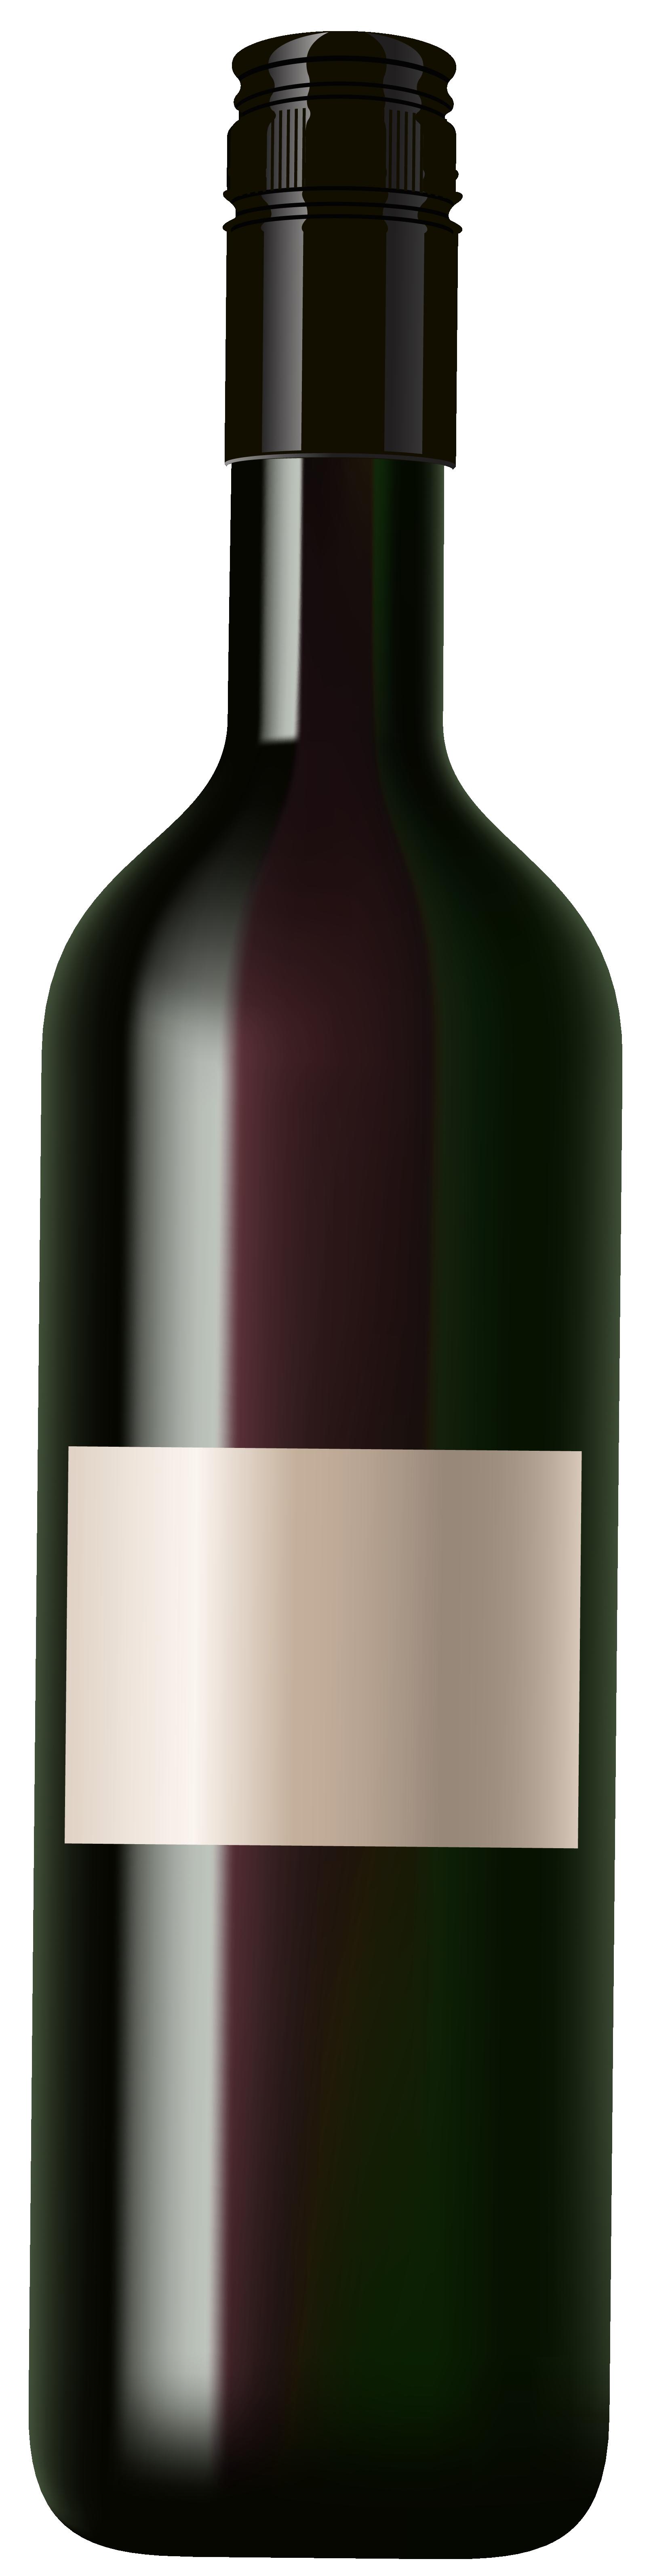 Clipart halloween wine. Bottle png clip art